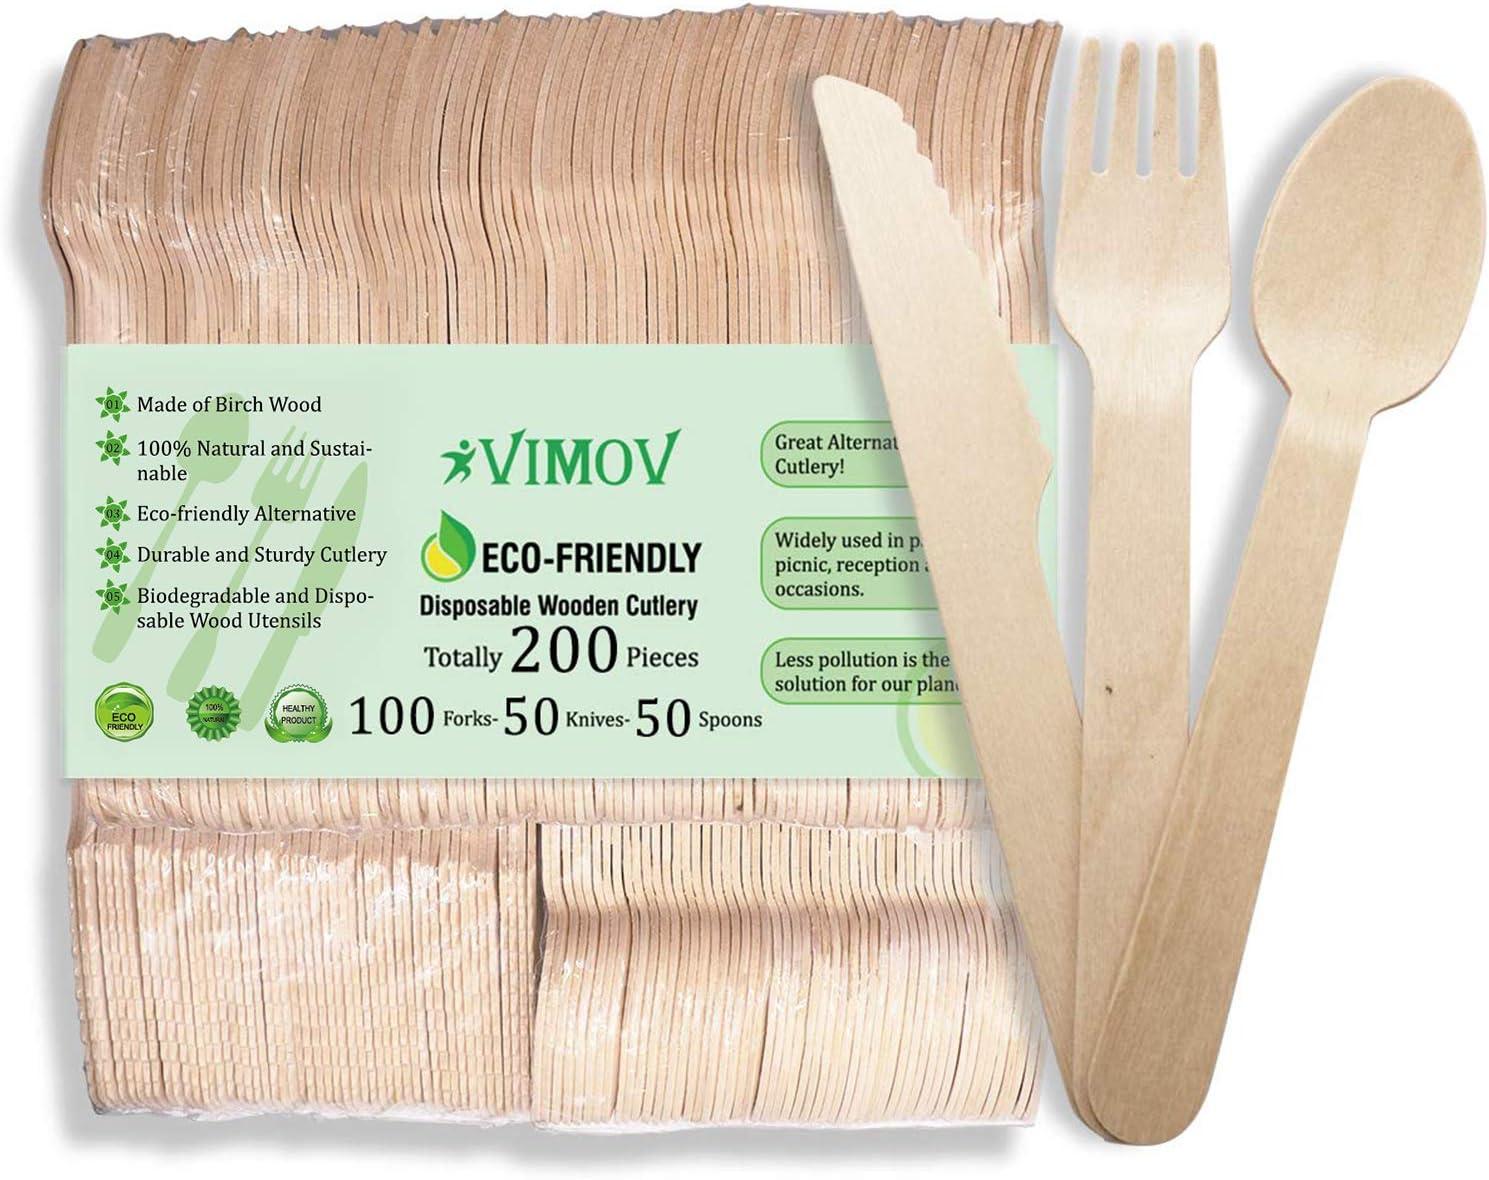 VIMOV 200 Pieza Cubiertos de Madera Desechables, Utensilios Biodegradables para Fiestas, Camping, Picnic, Barbacoa, Evento (100 Tenedores de Madera, ...